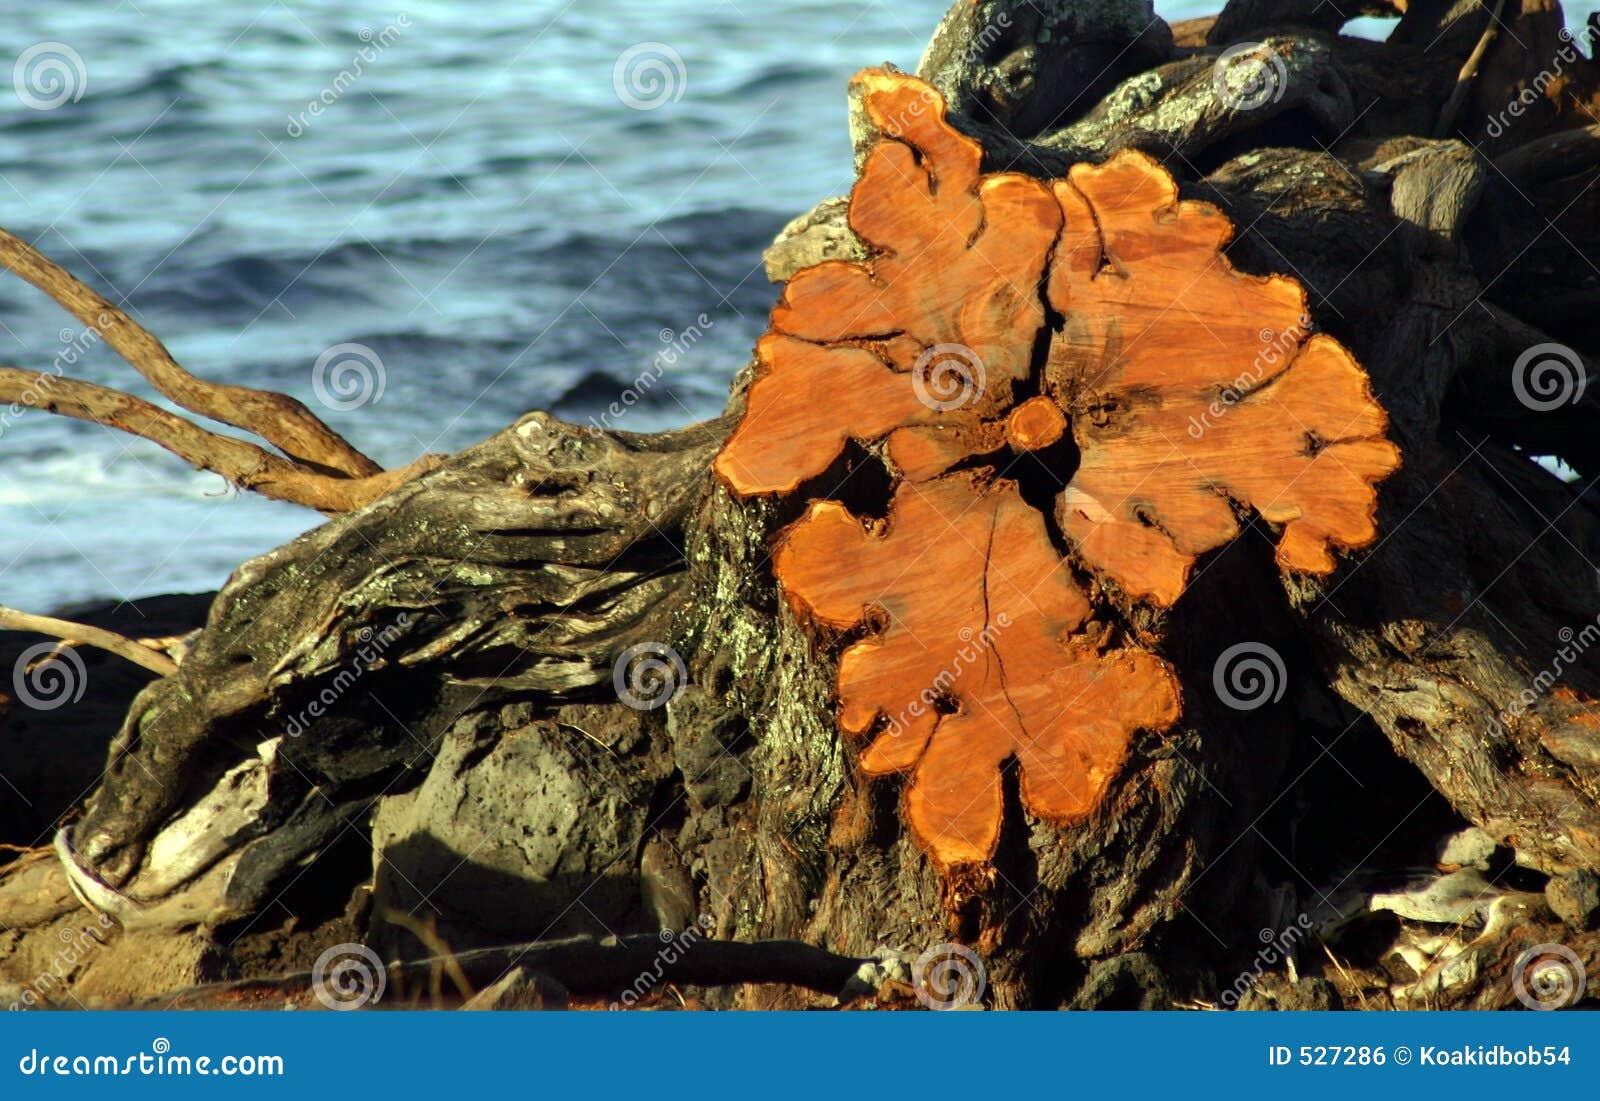 Download 节夏威夷海岛映射 库存照片. 图片 包括有 旅行, 海边, 异常, 机会, 本质, 复制品, 漂流木头, 怪异 - 527286